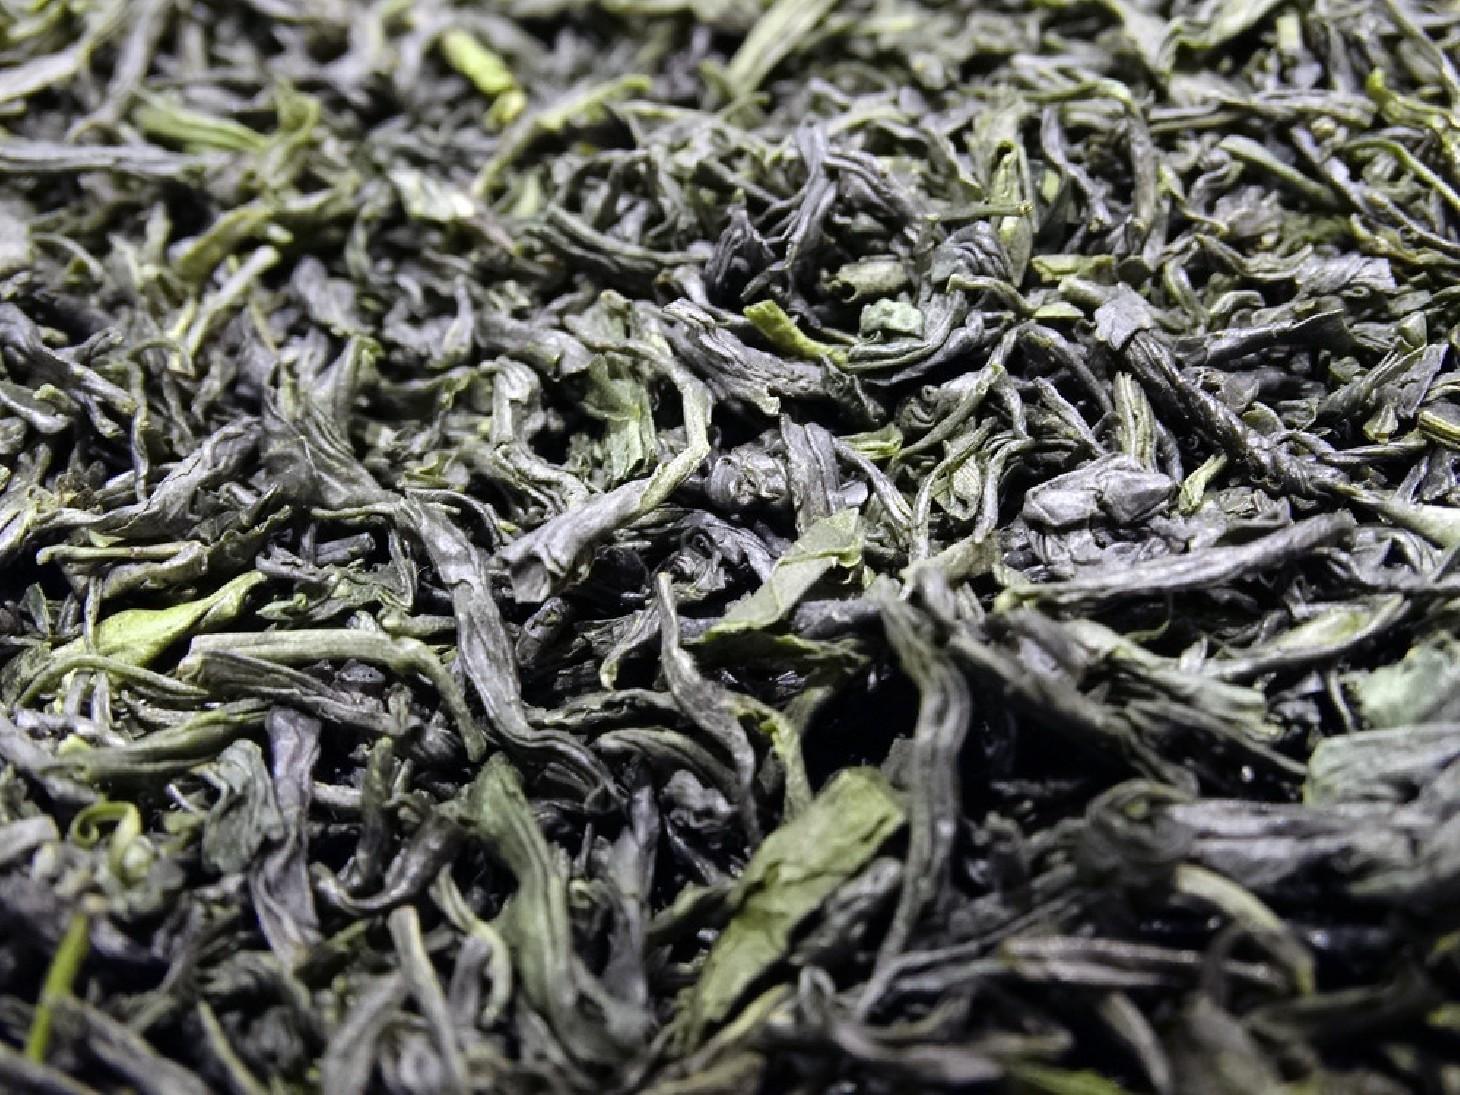 Green tea First Flush Hubei, China pure origin